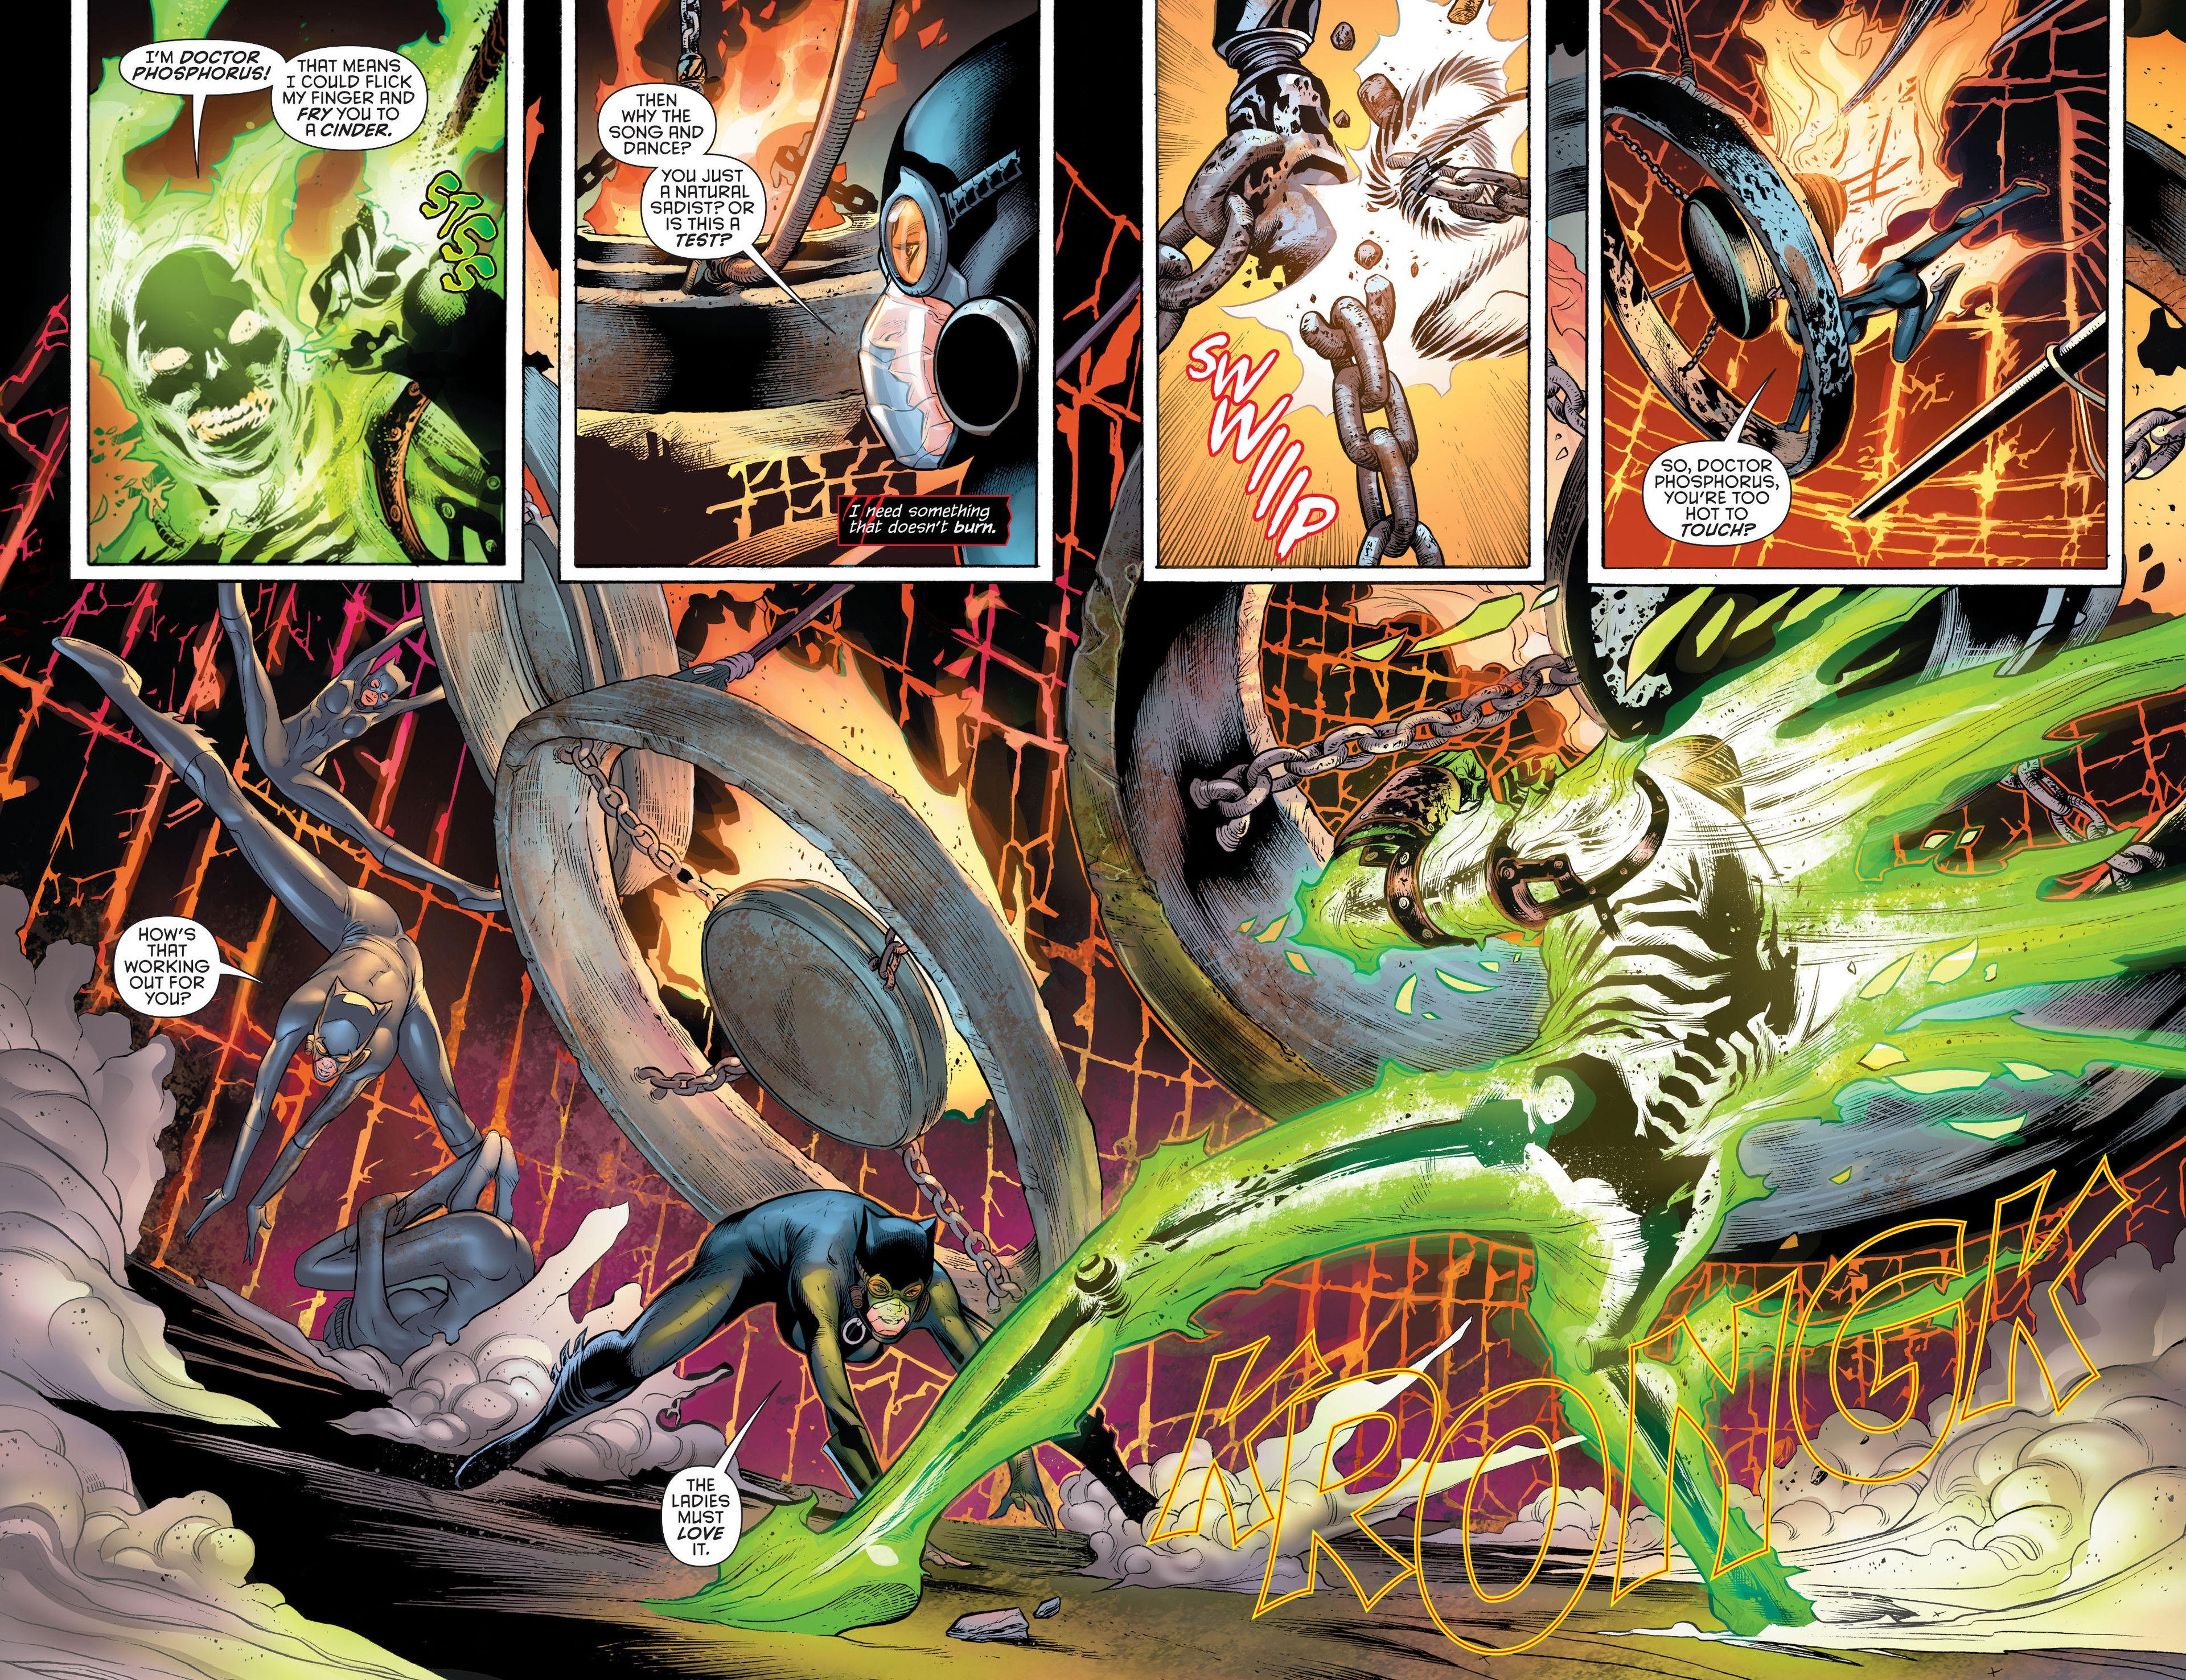 Zimmerwand graffiti catwoman  comics  superheroes  pinterest  comic superheroes